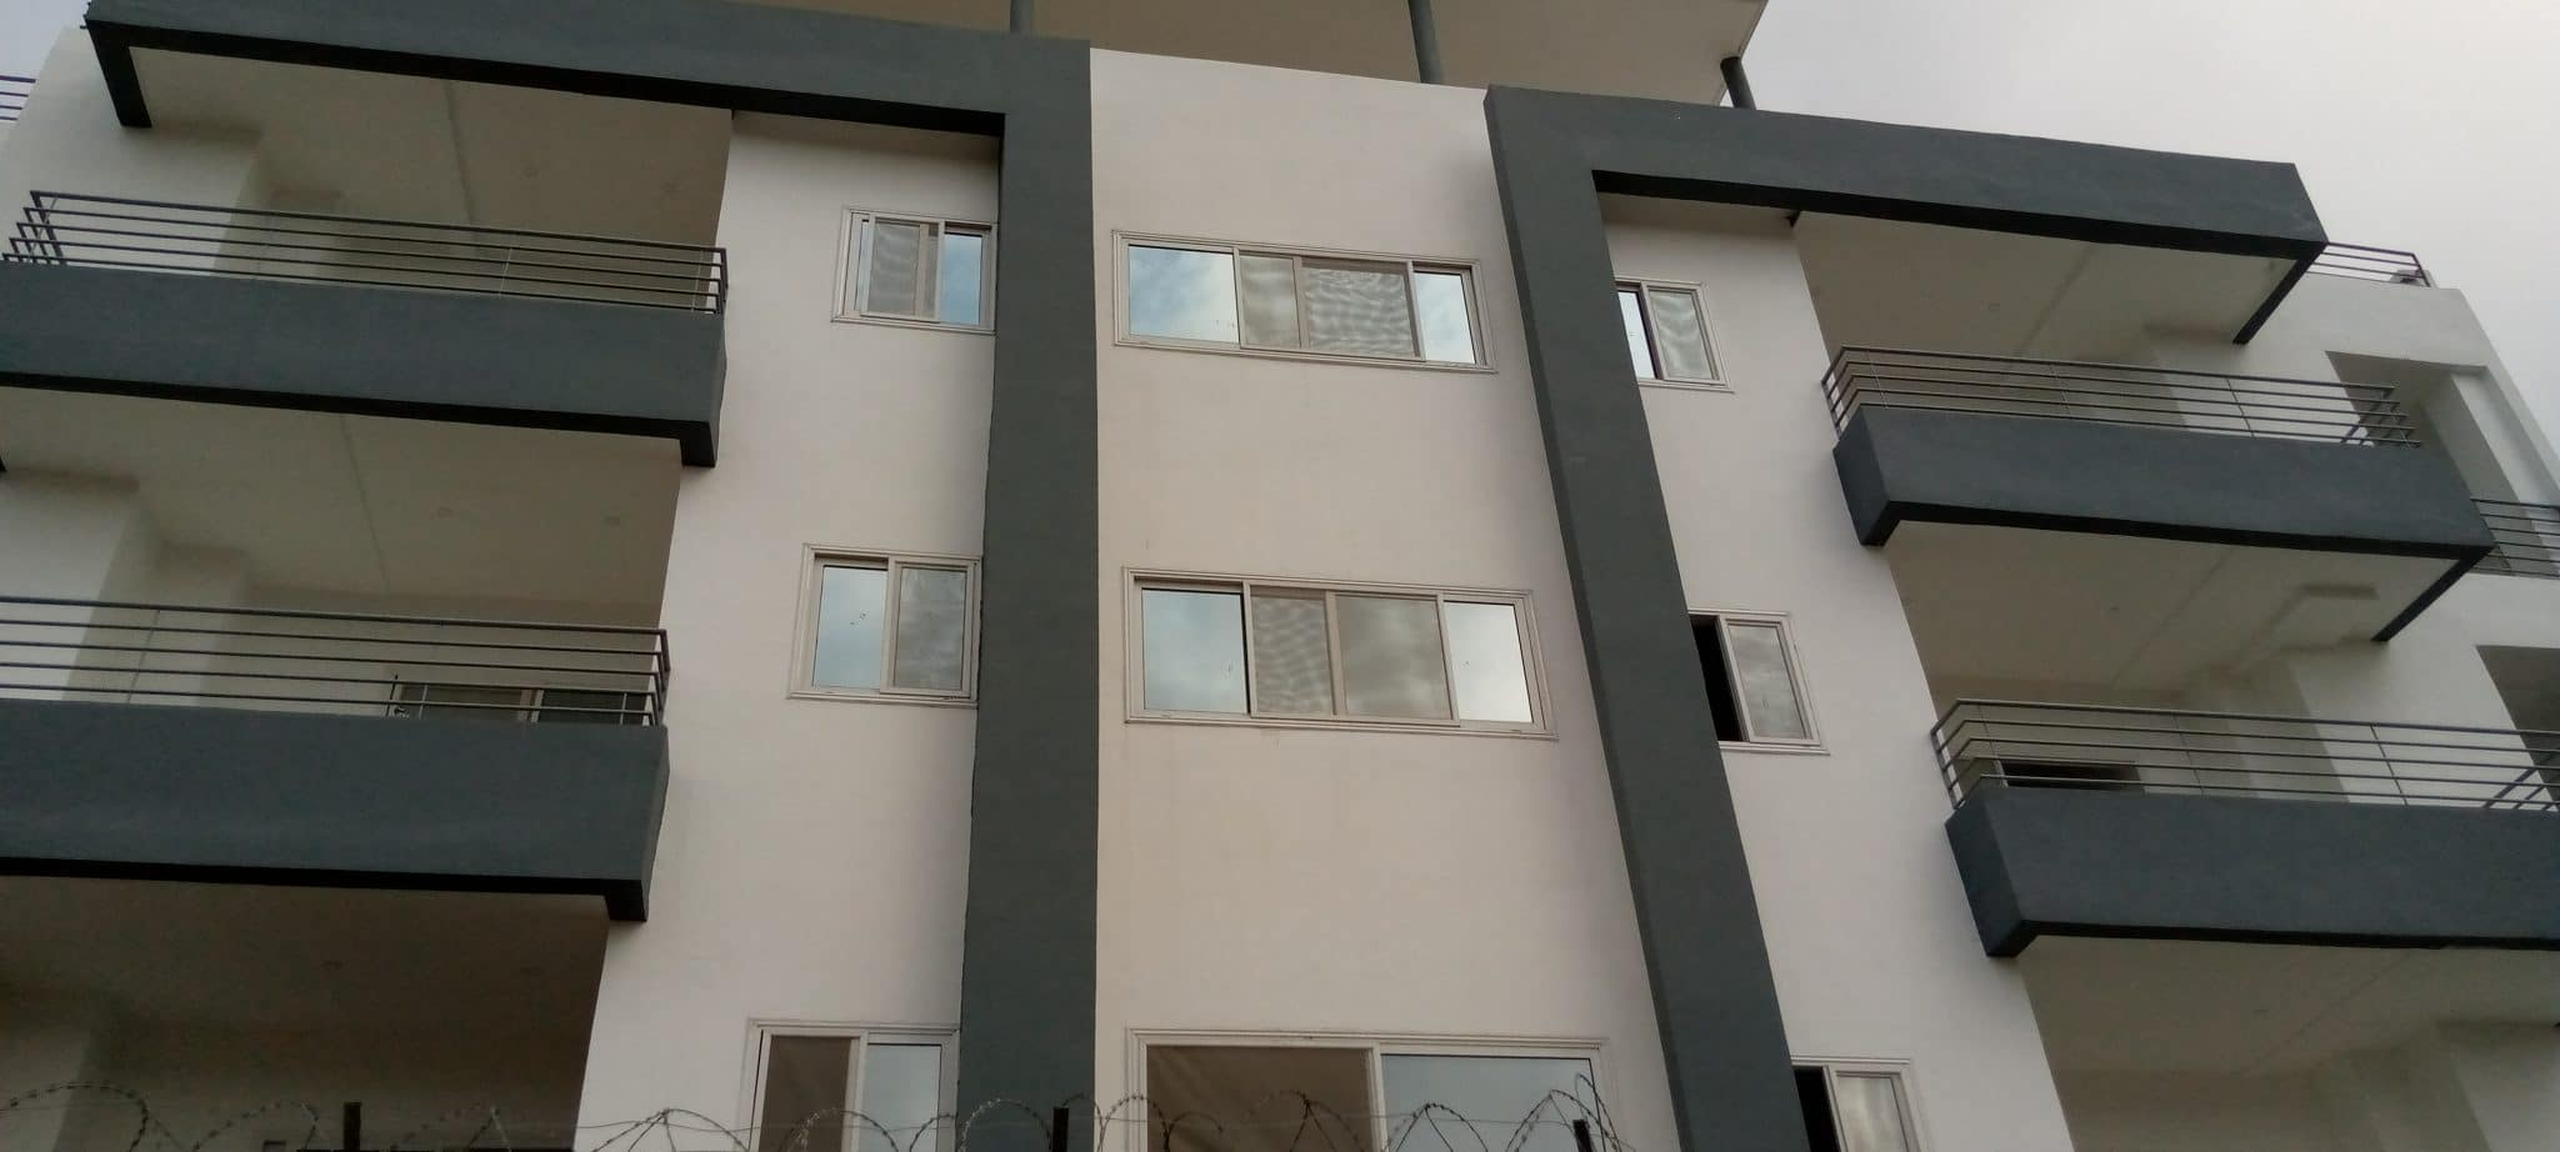 Appartement haut standing à Cocody atoban